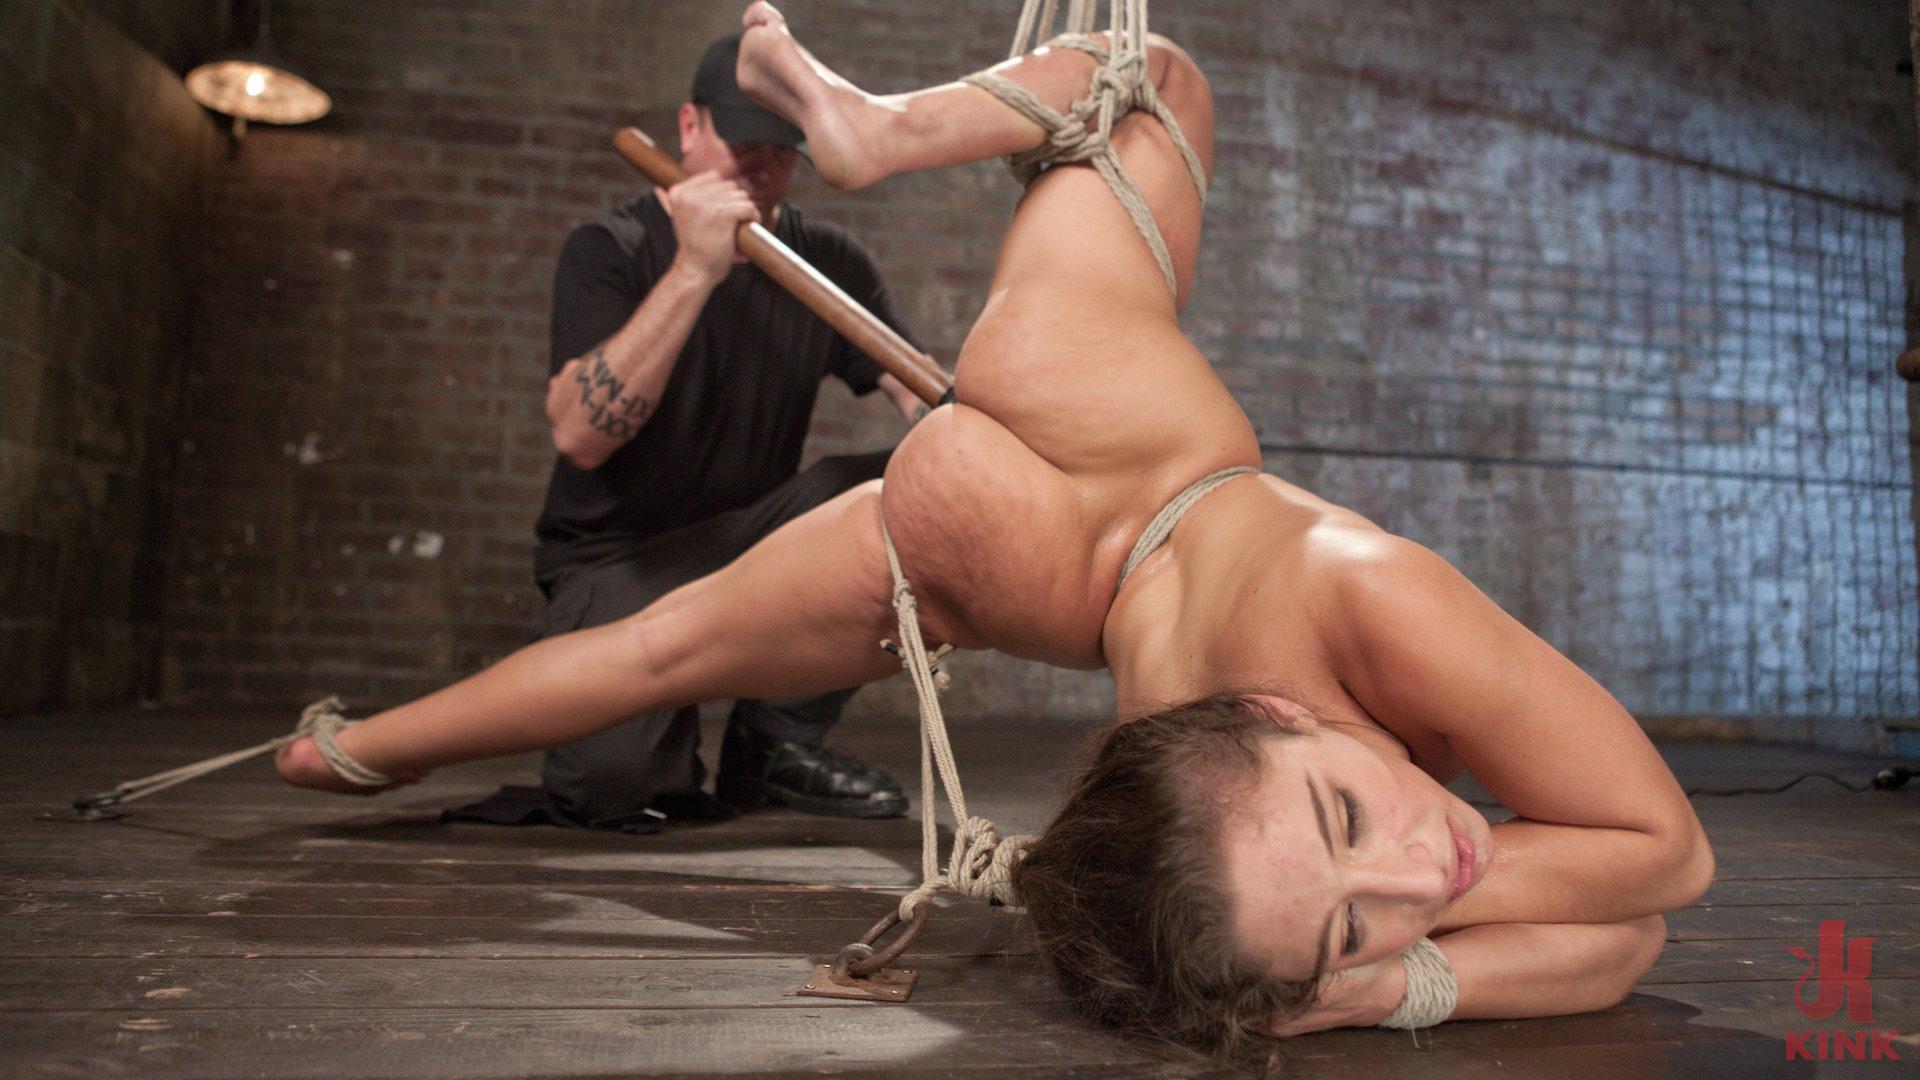 19-Year-Old-Rope-Slut-Suffers-in-Extreme-Bondage